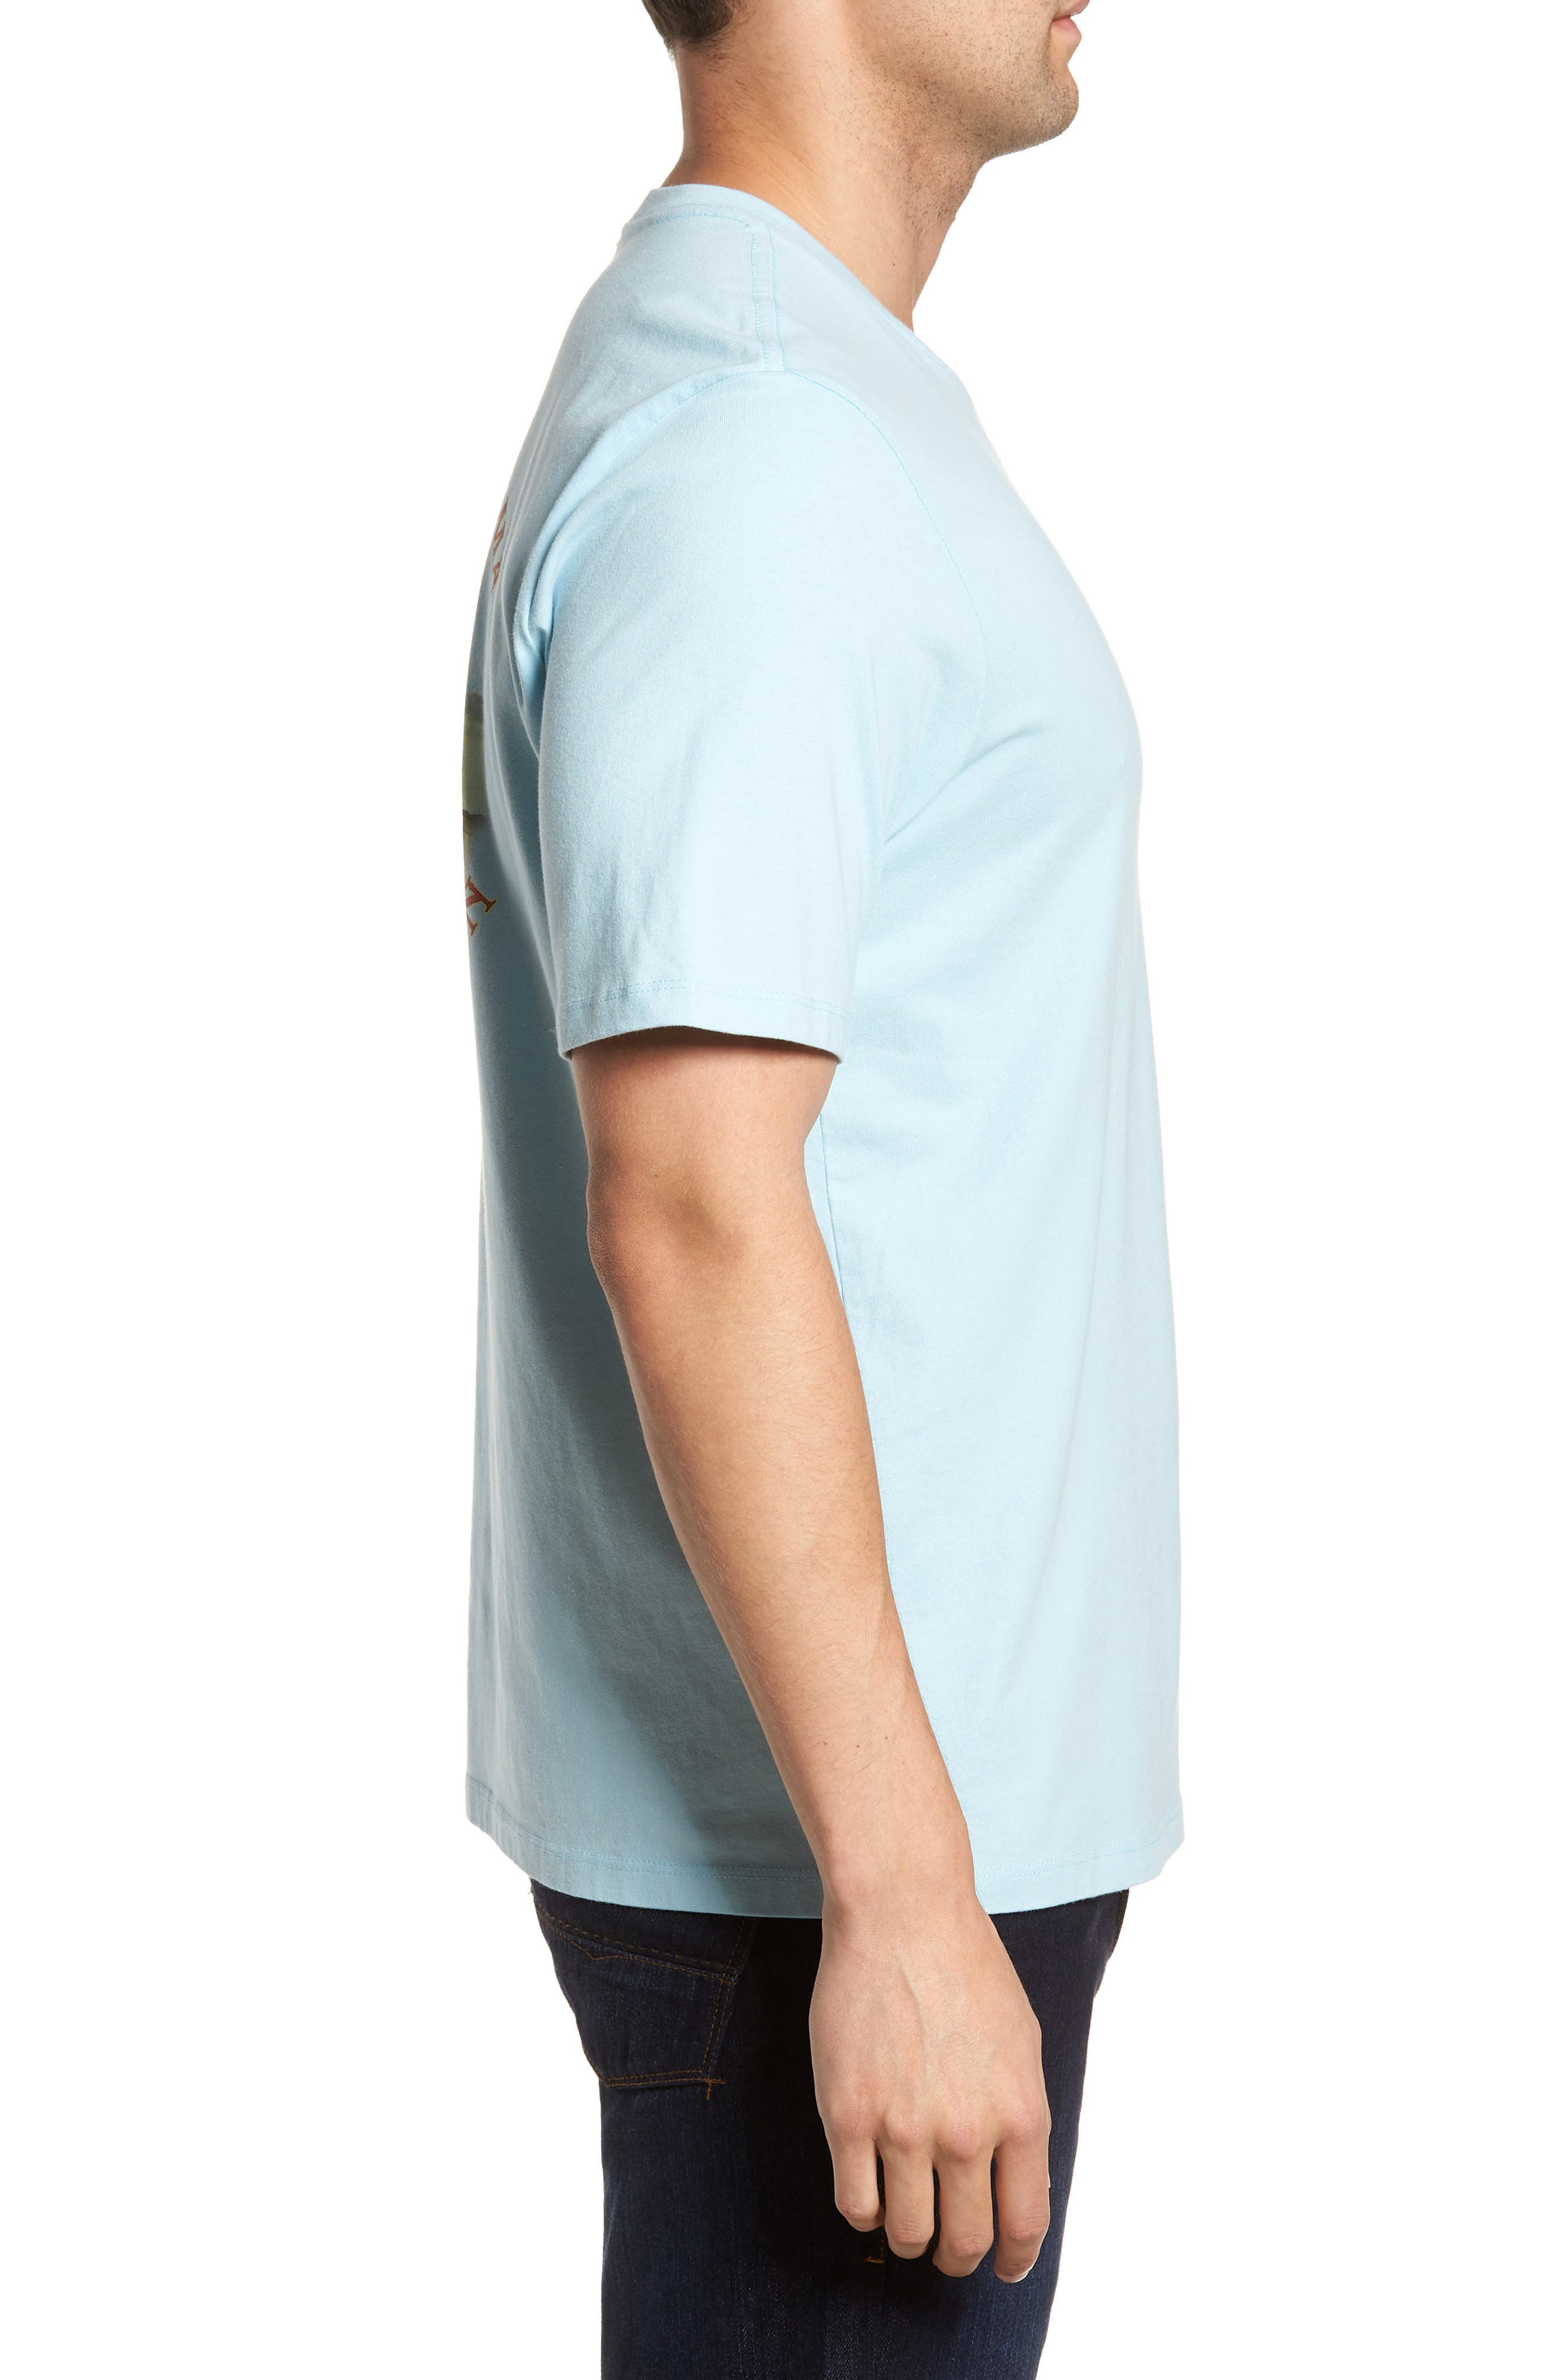 Zinspiration T-Shirt,                             Alternate thumbnail 3, color,                             Opal